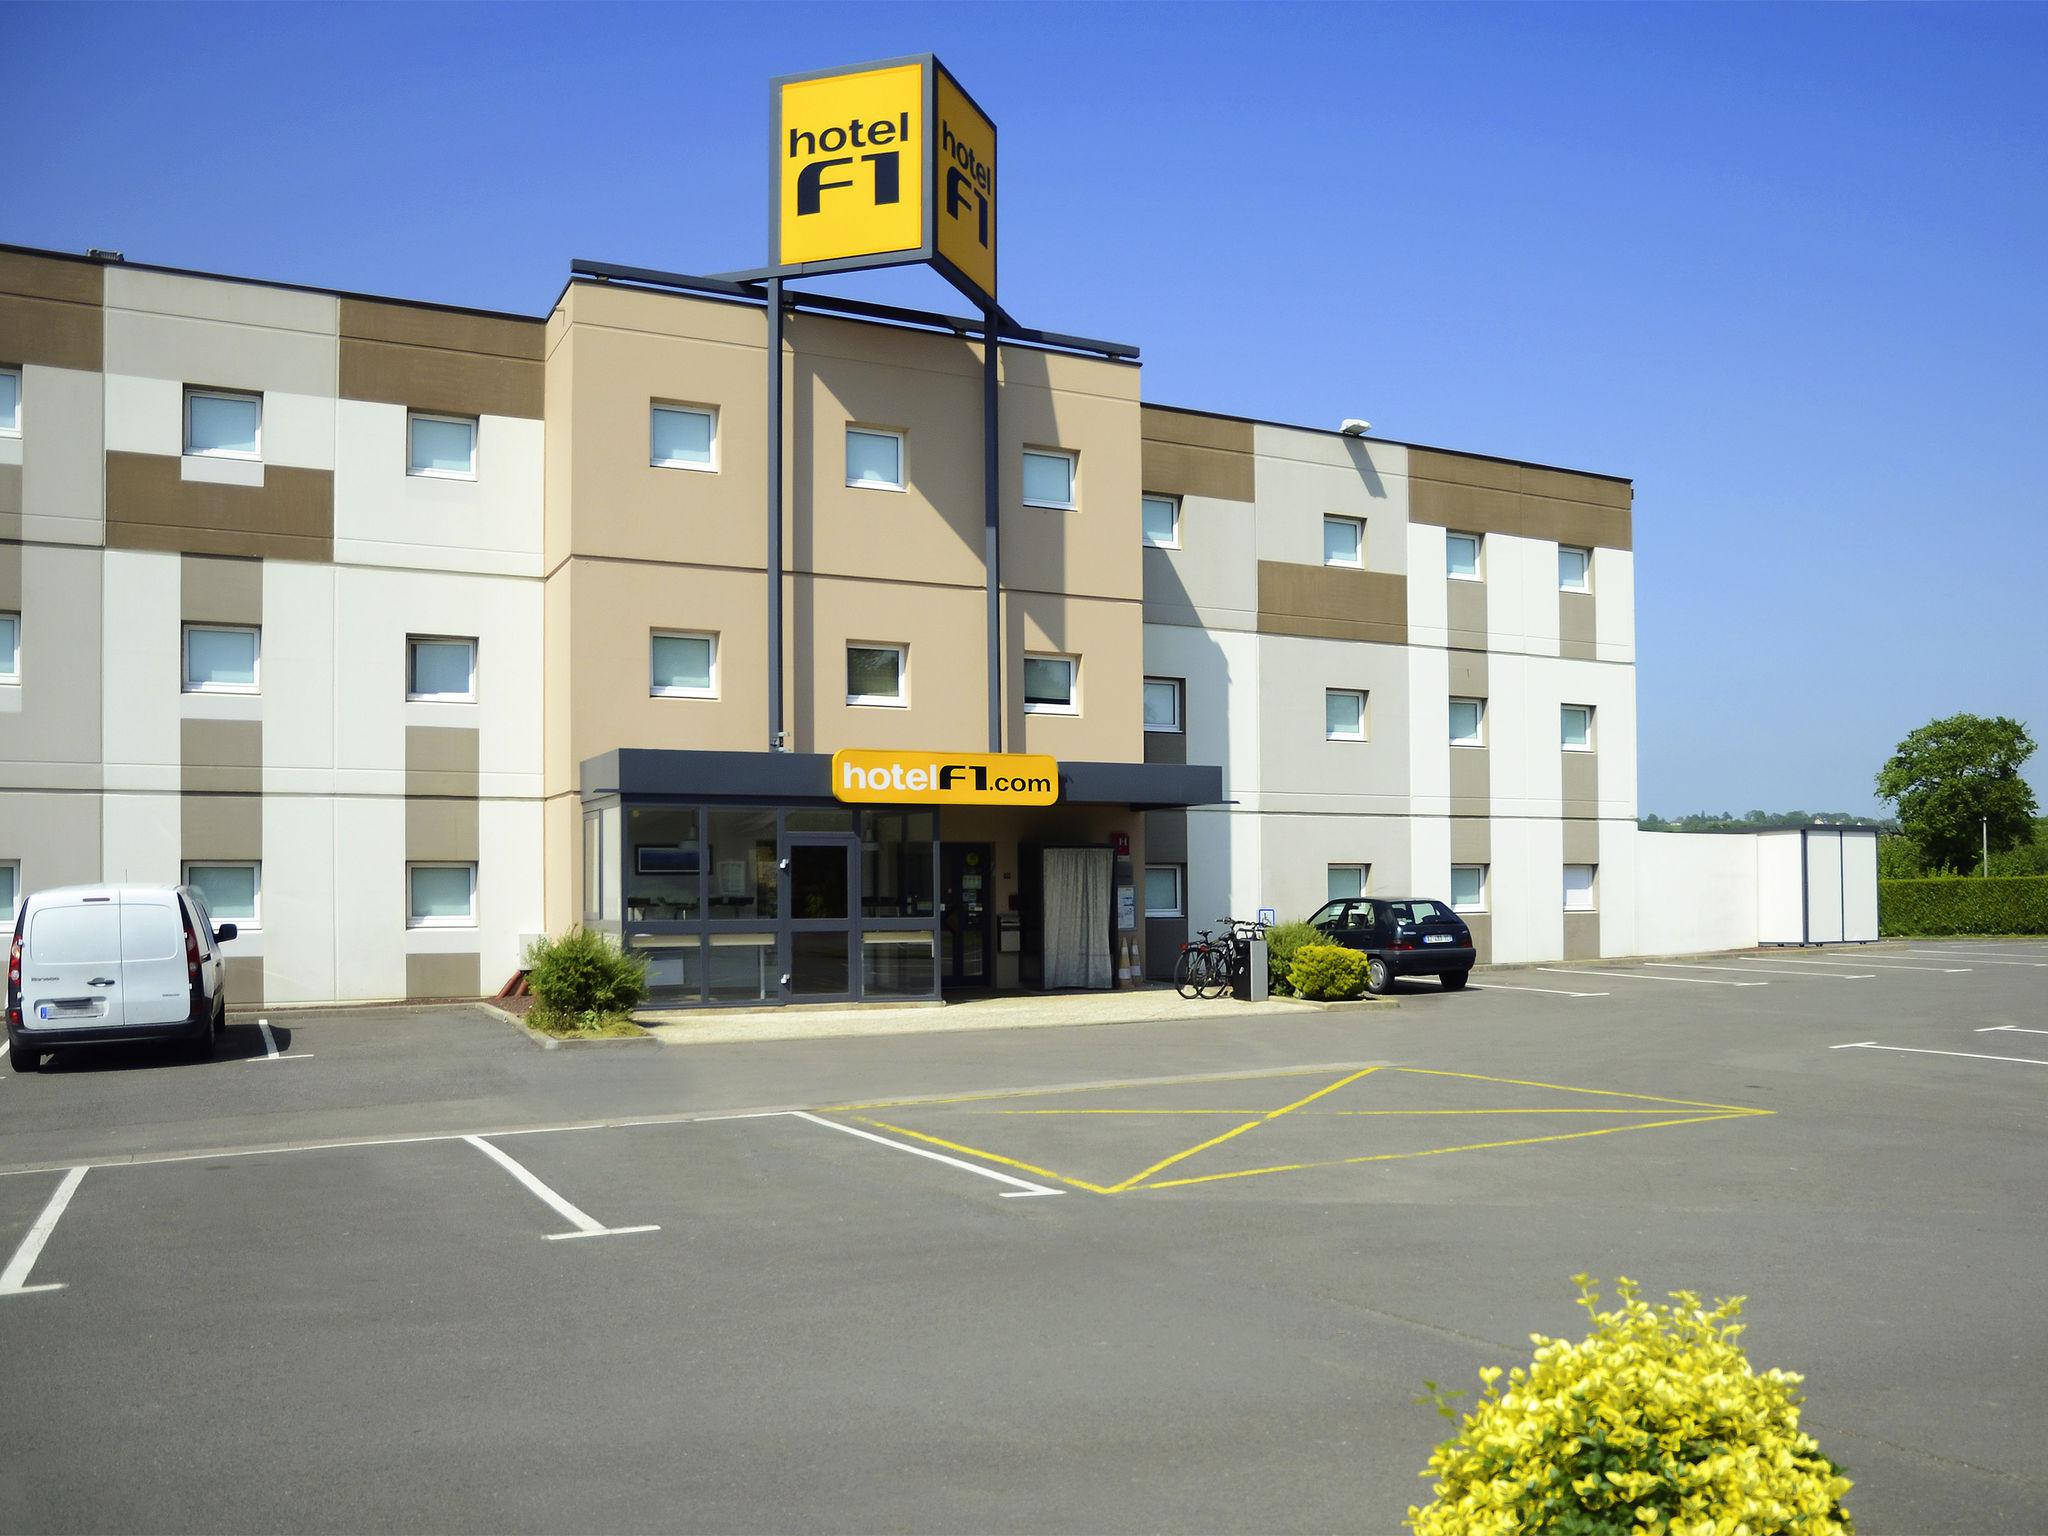 酒店 – hotelF1 Avranches Baie du Mont-Saint-Michel